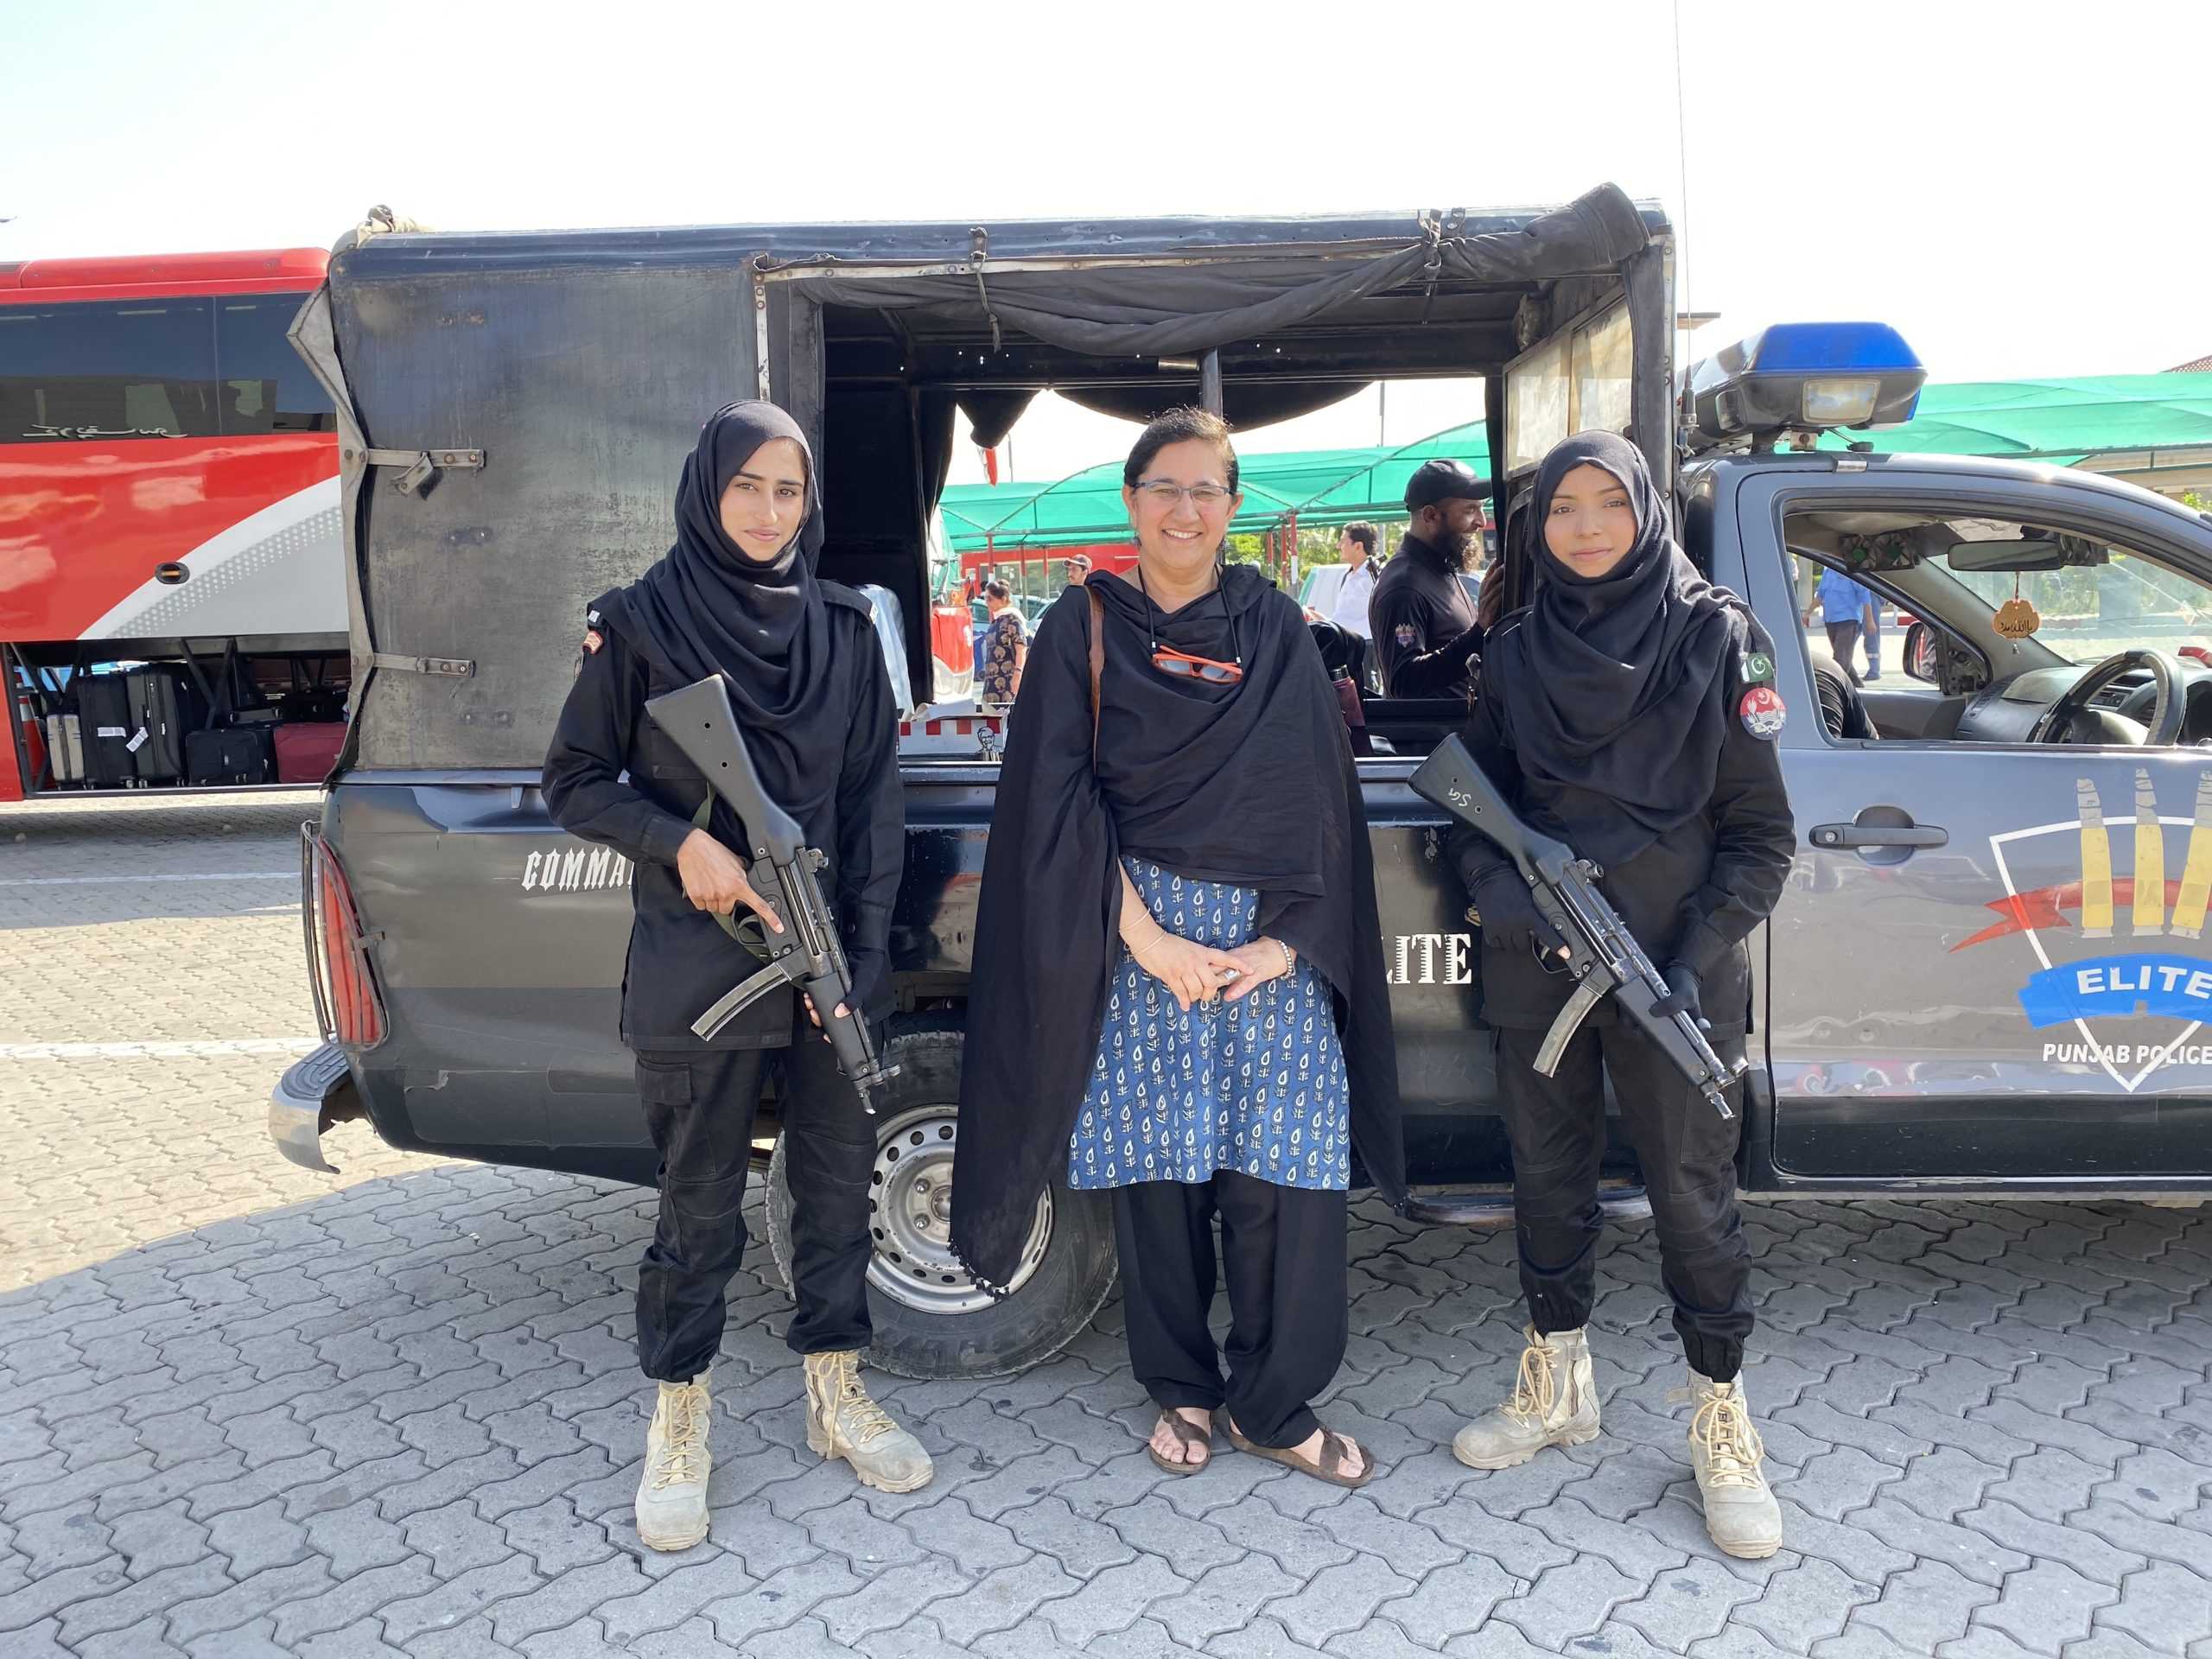 Punjab Police Commandos Photo by AK Sandhu